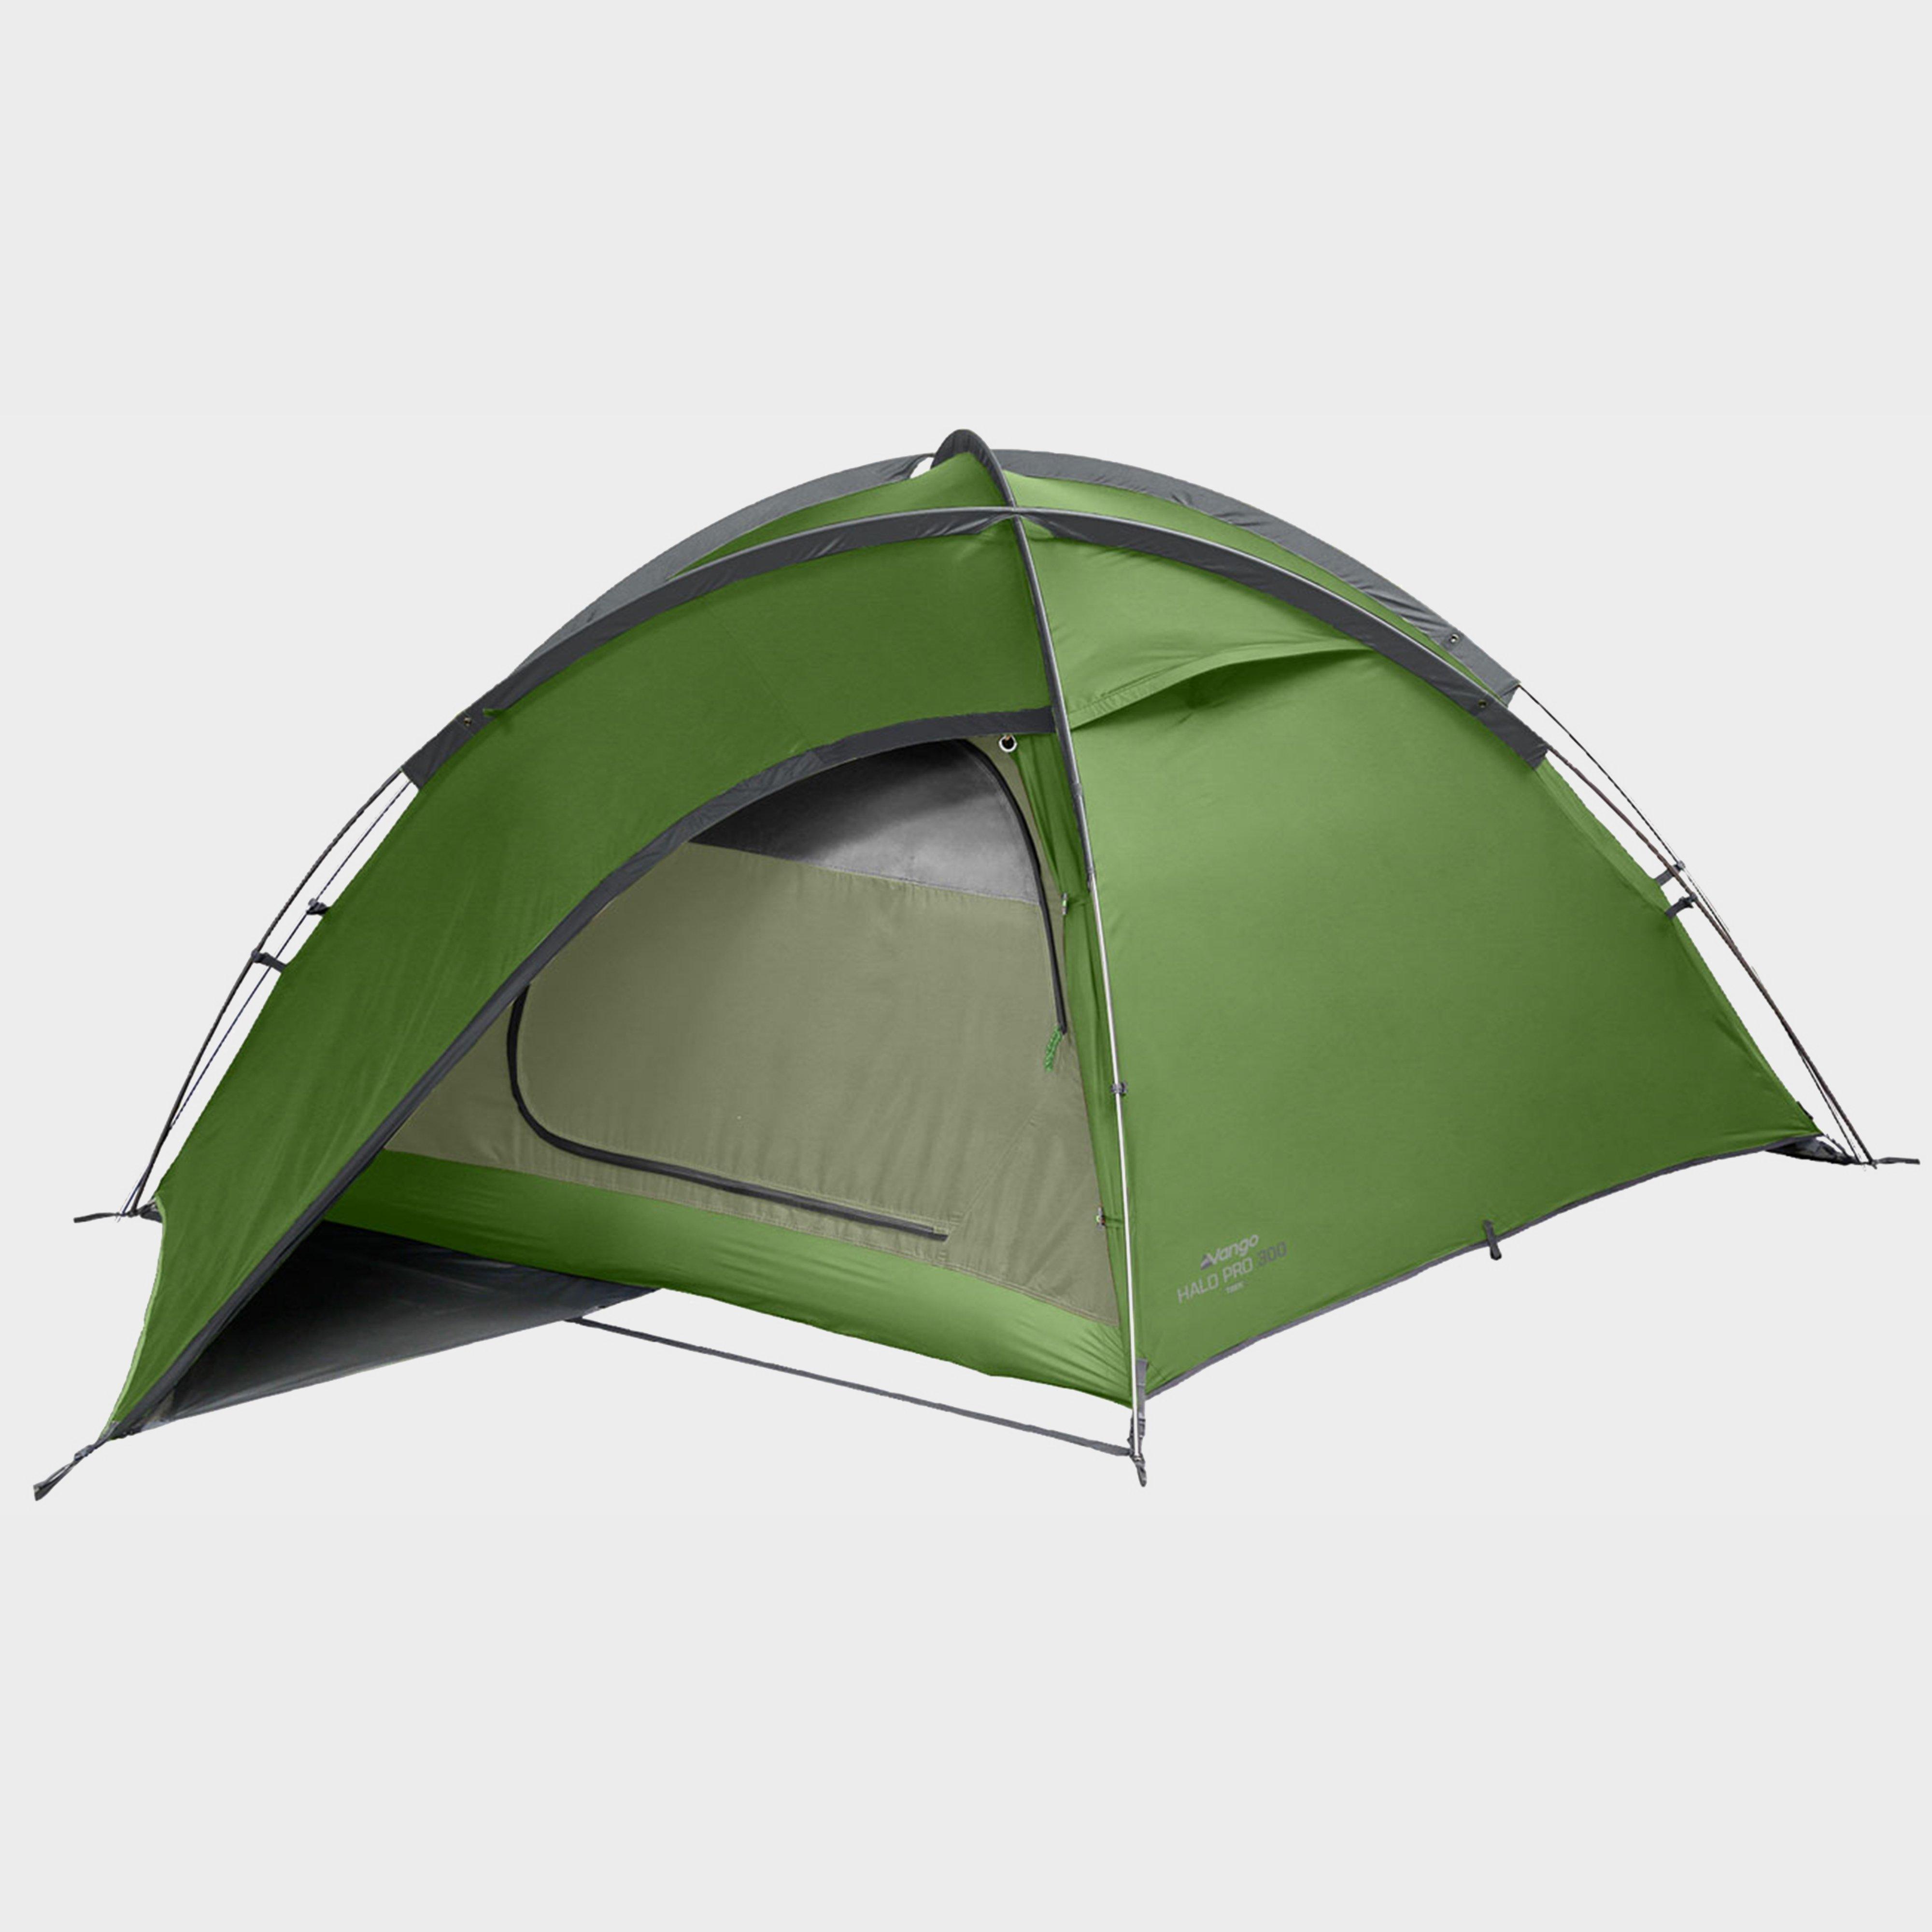 Vango Halo Pro 300 Backpacking Tent - Grn/Grn, Grey